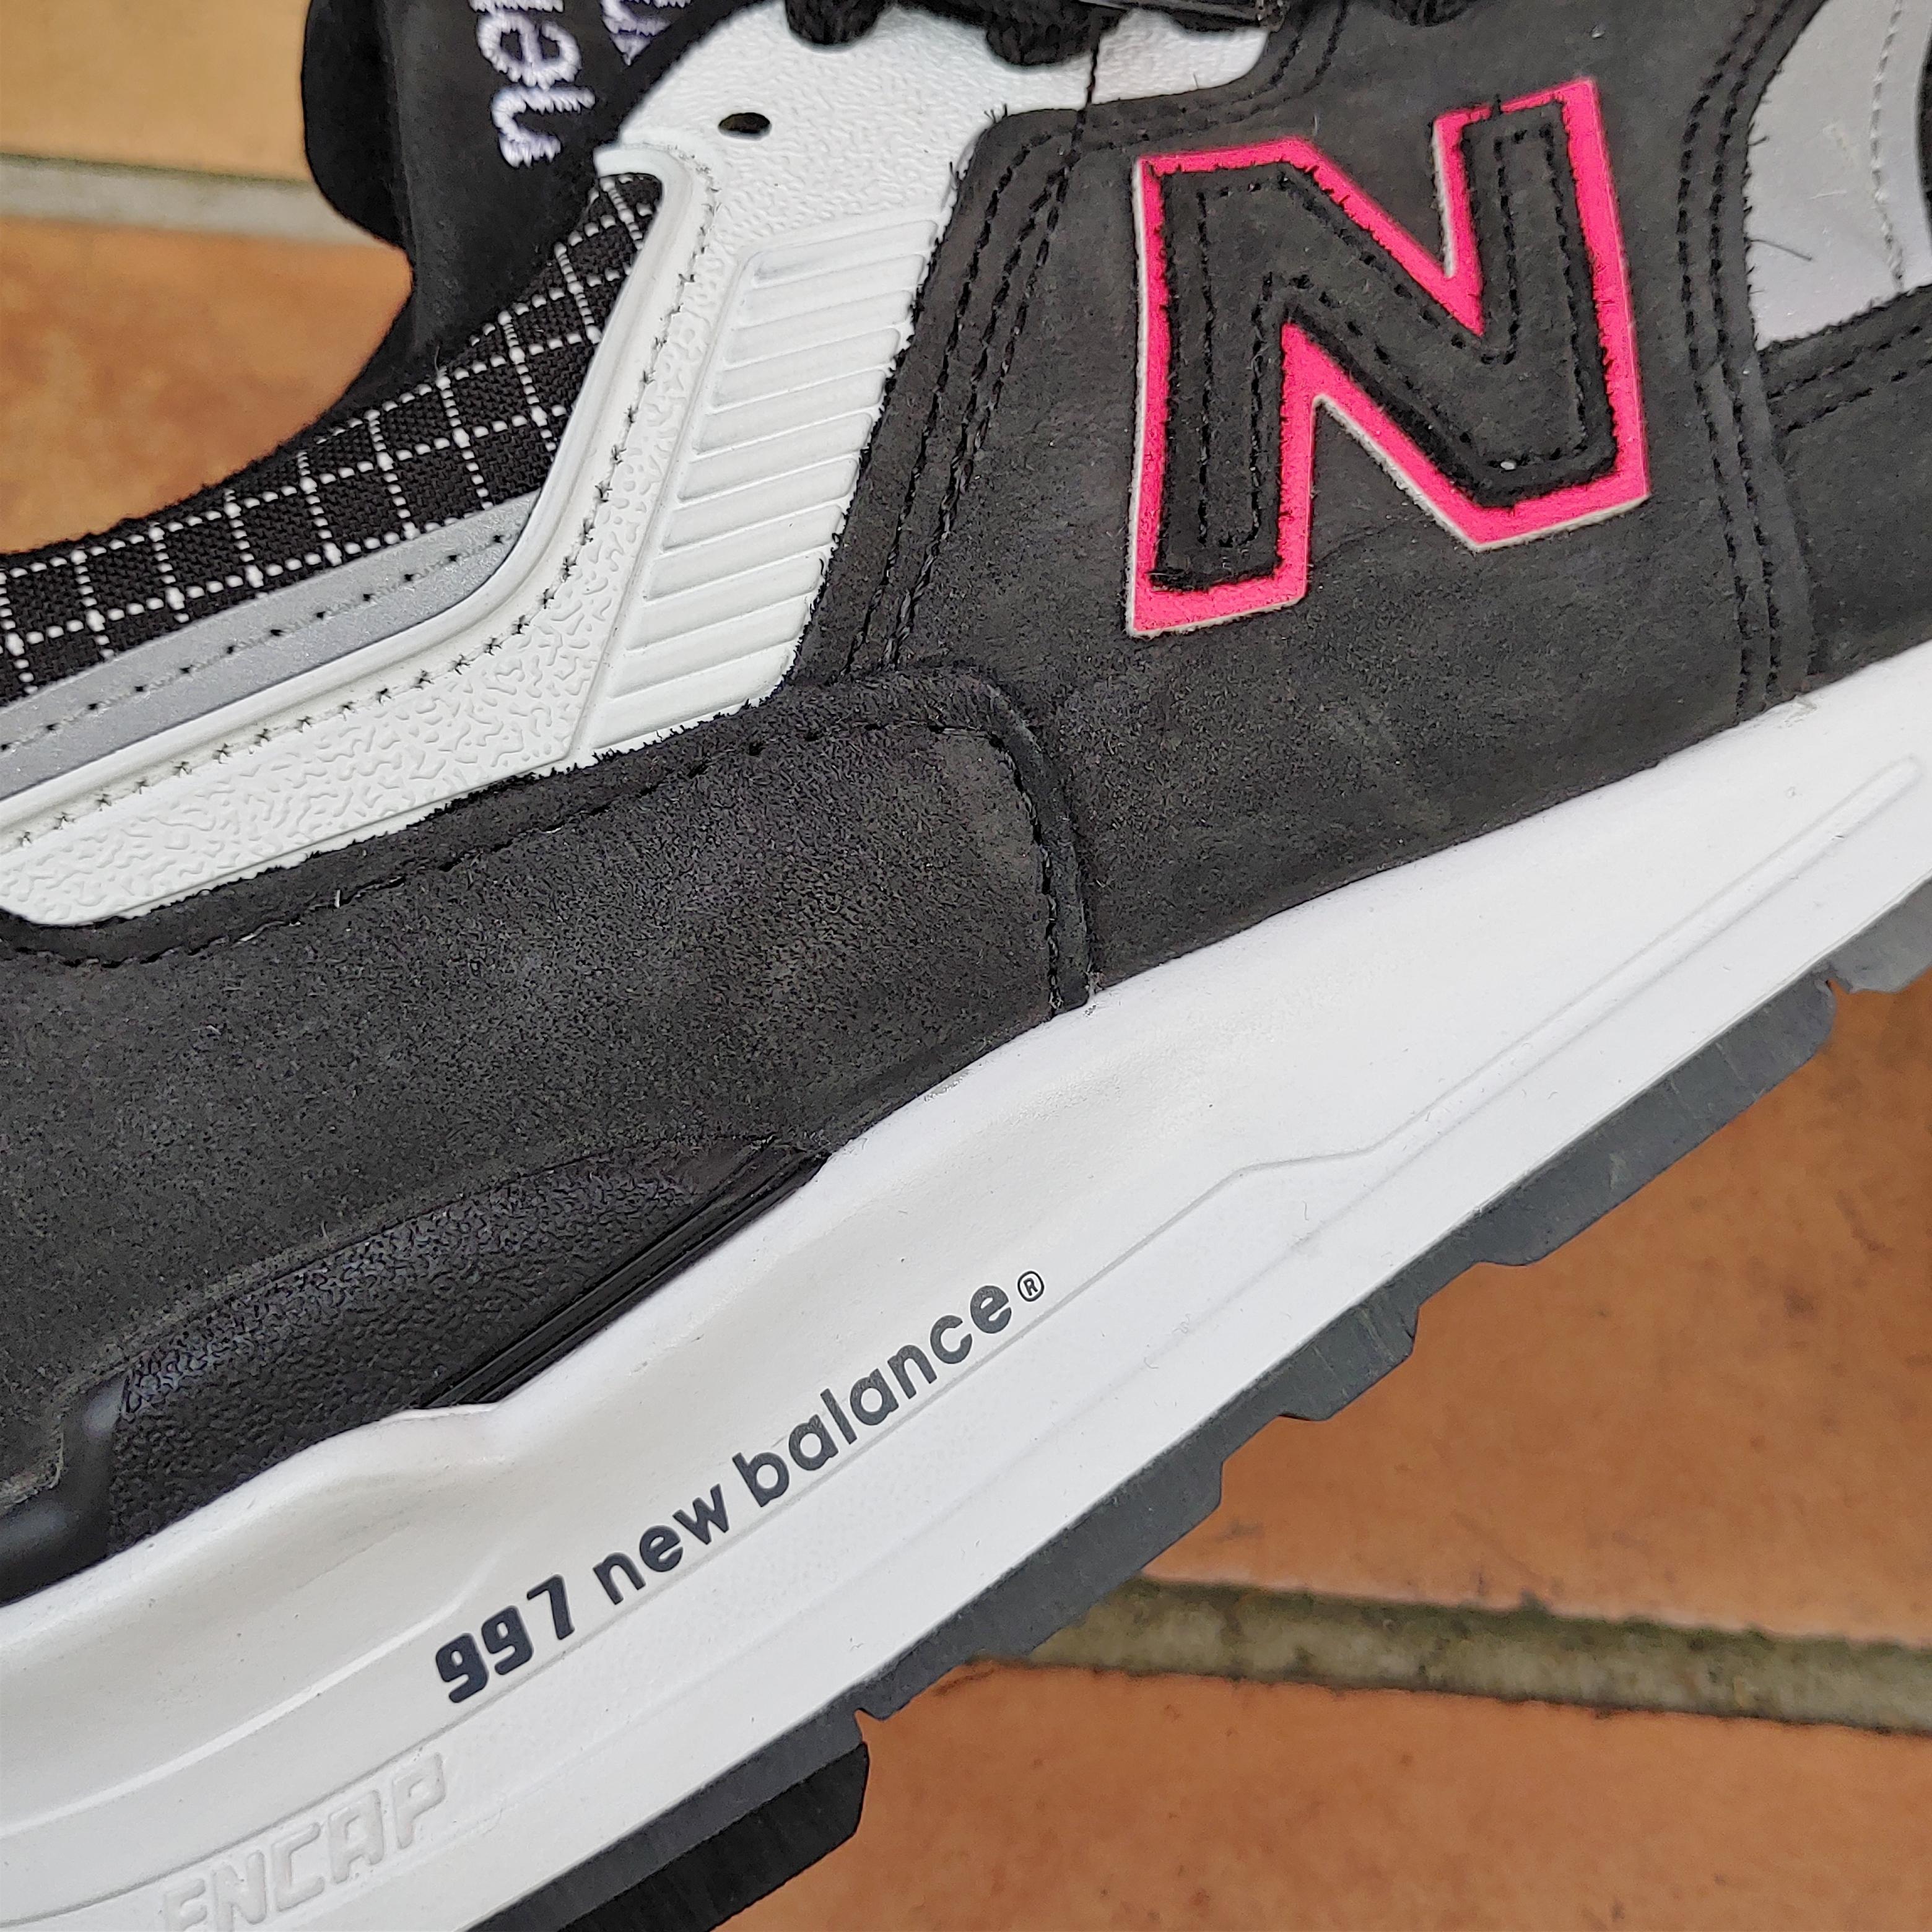 【USA】NEW BALANCE 997 US8(26cm)